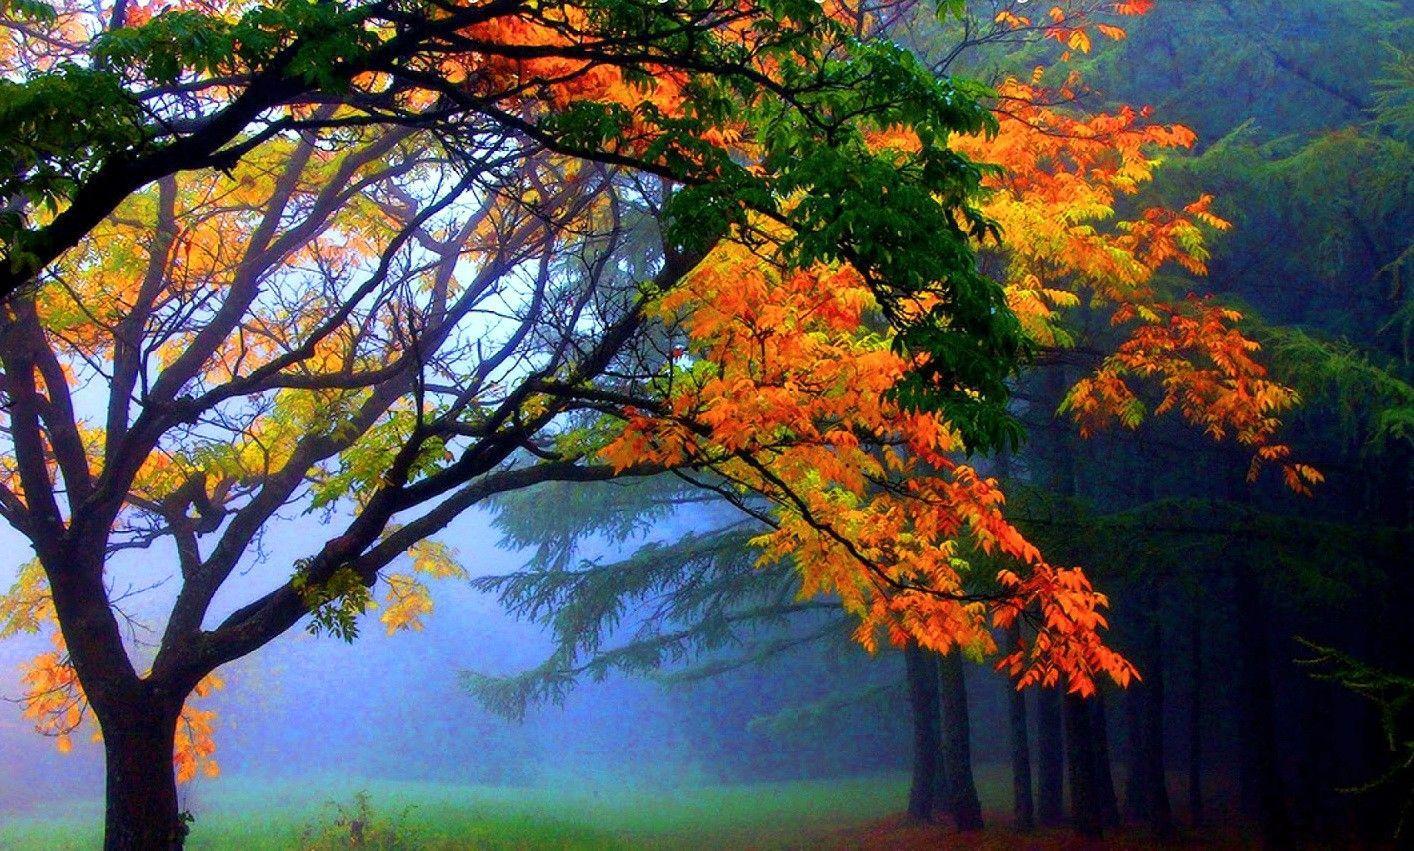 October Scenery Wallpapers - Top Free October Scenery ...